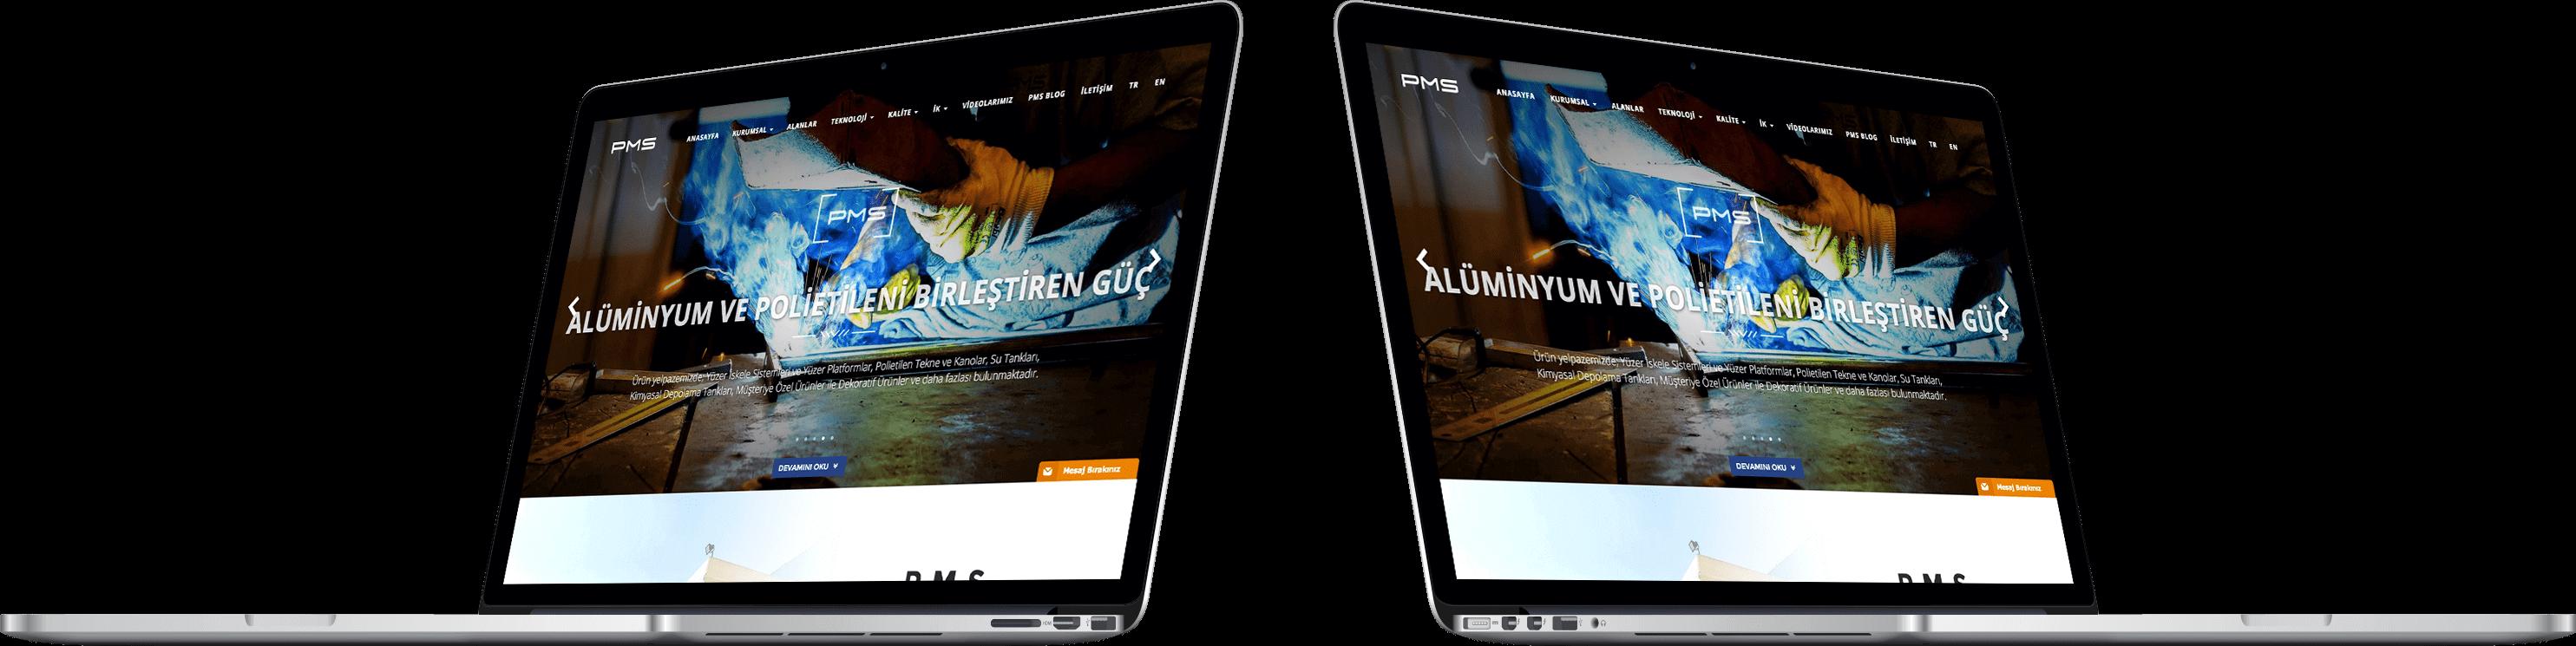 PMS | Web Tasarım